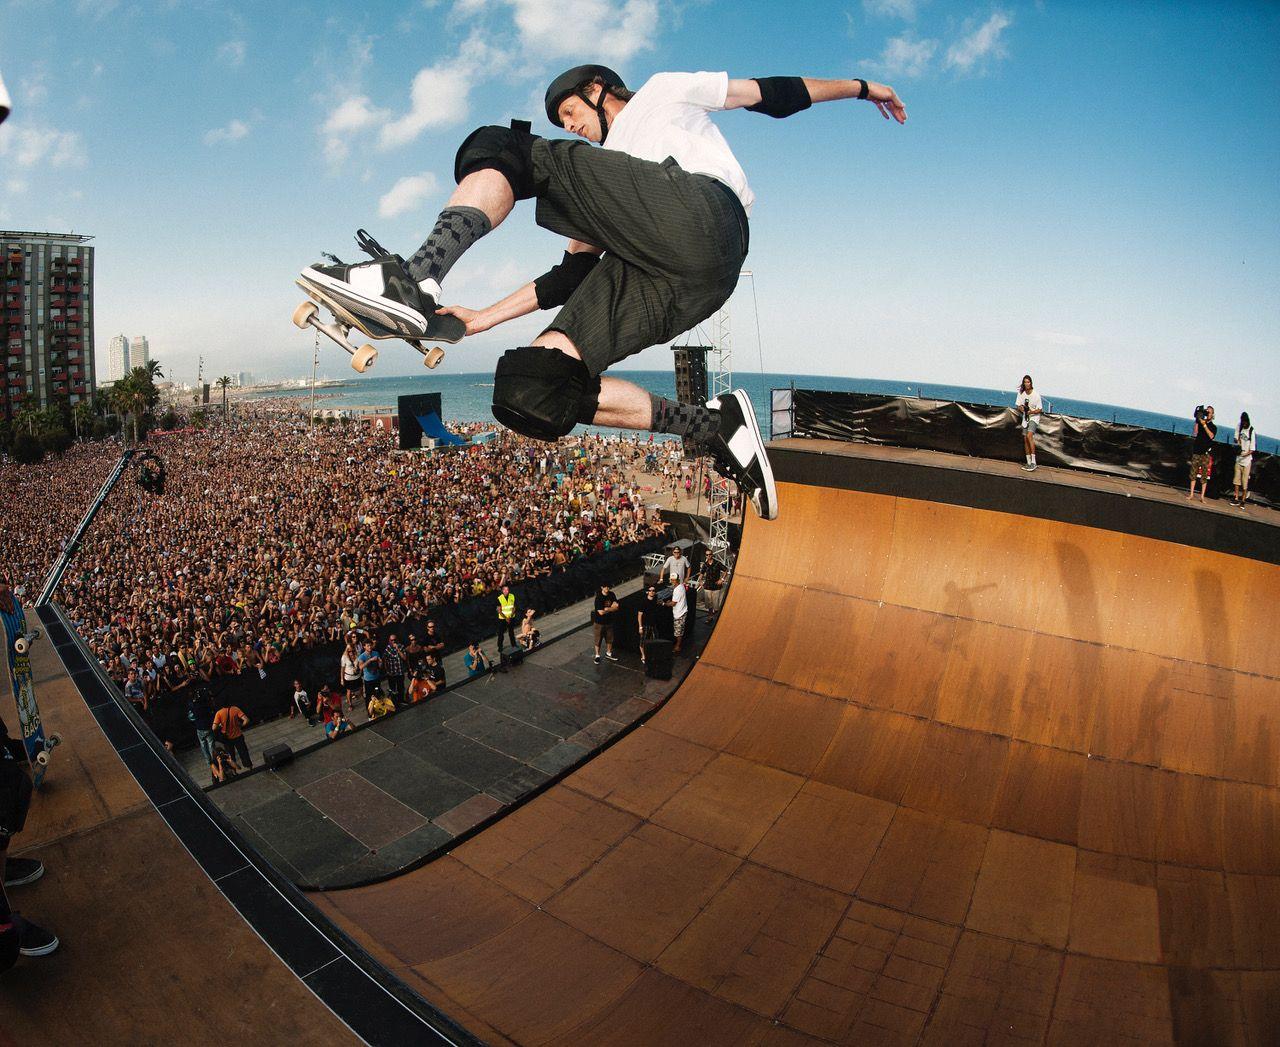 Skateboard Girl Wallpaper Tony Hawk At 50 Skateboarding Legend Talks Career Fame